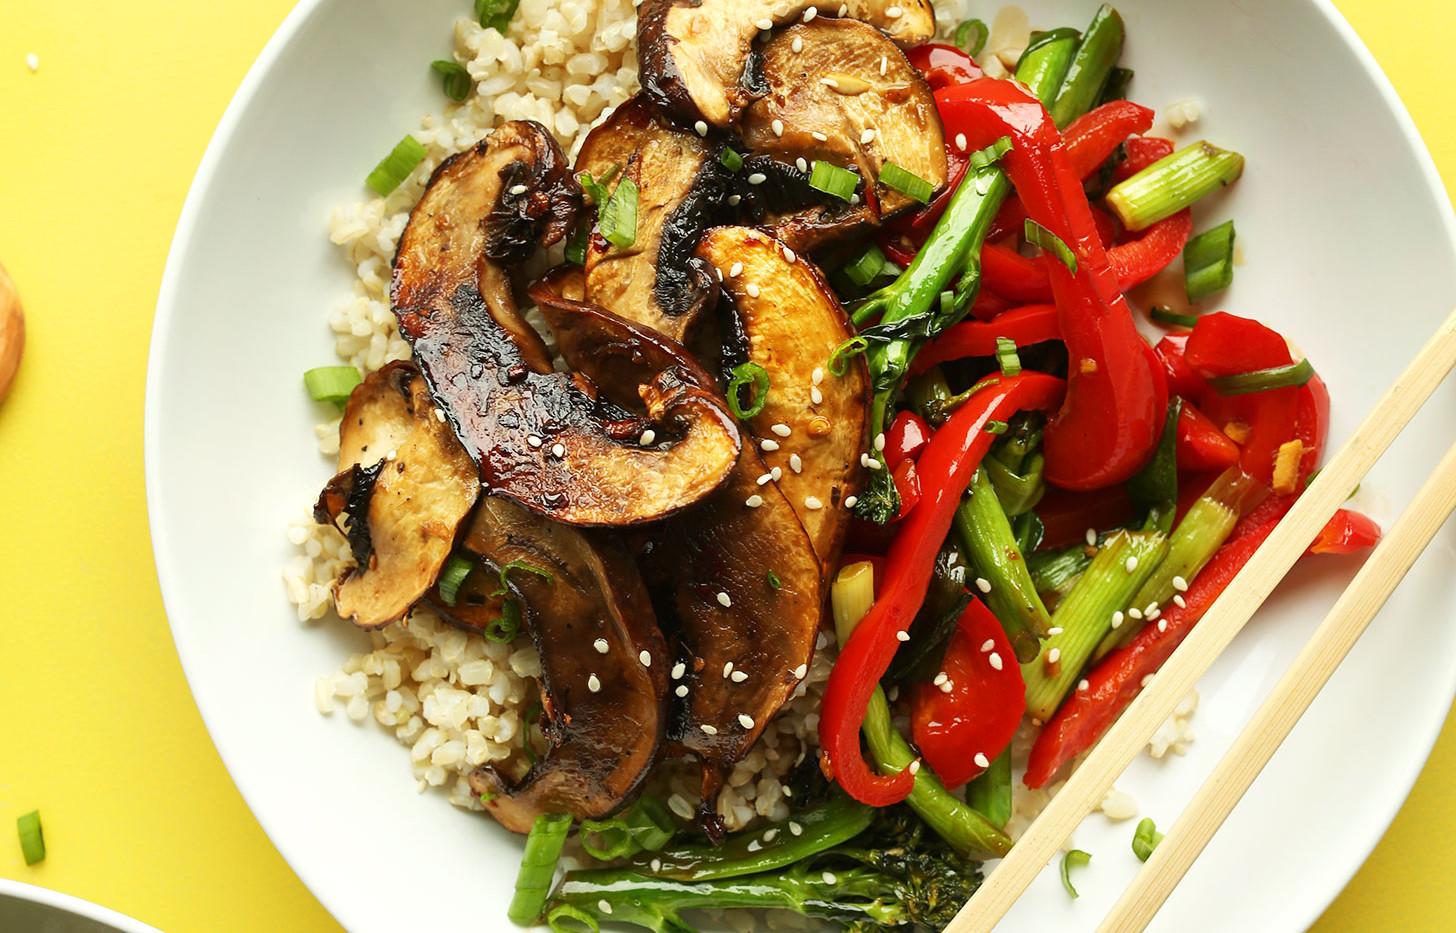 AMAZING-Flavorful-Portobello-Mushroom-St